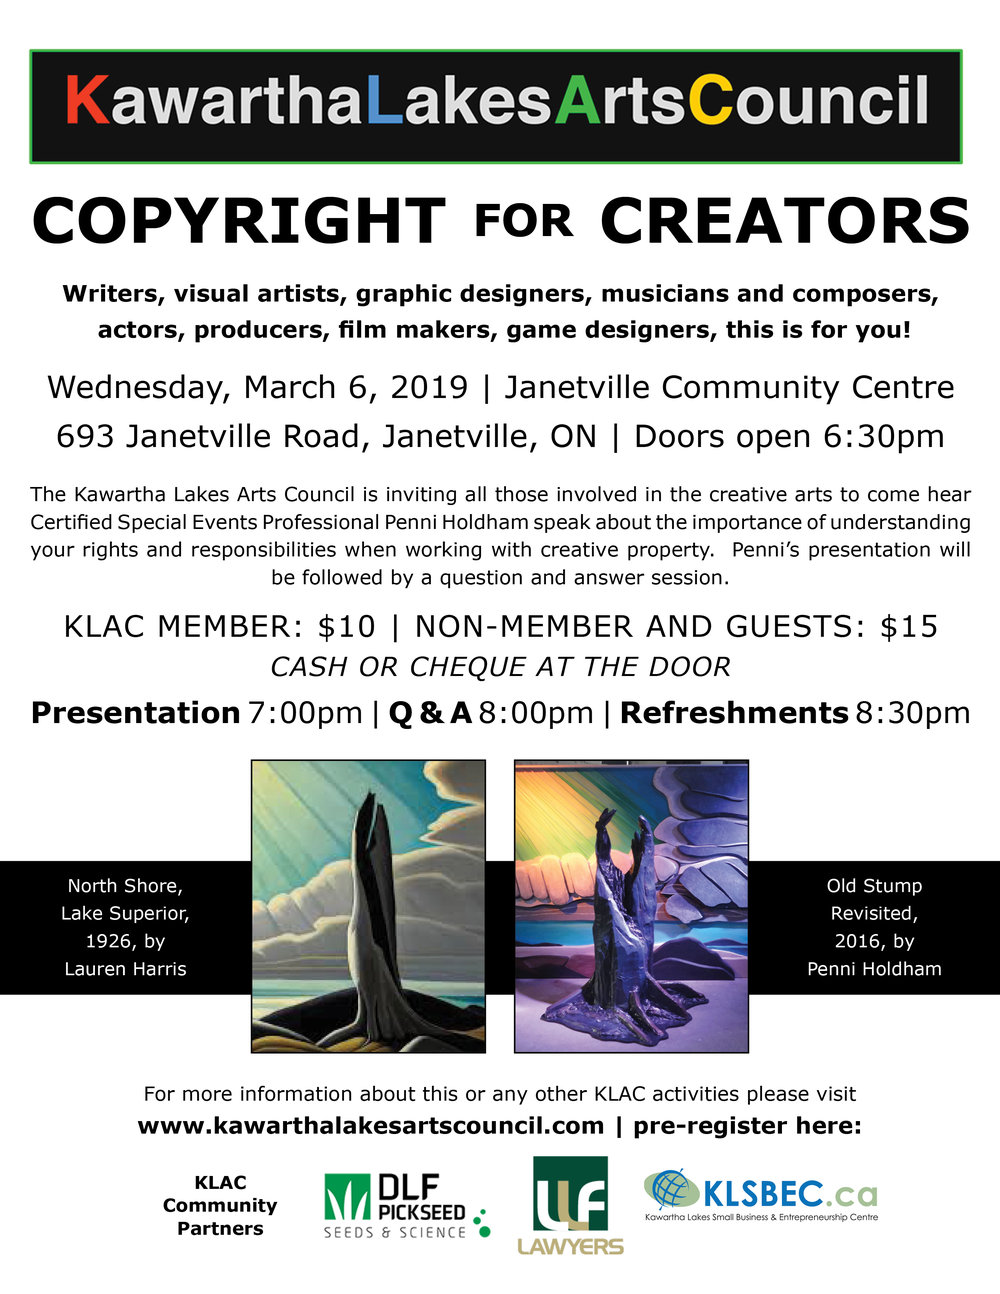 KLAC - Copyright Poster.jpg